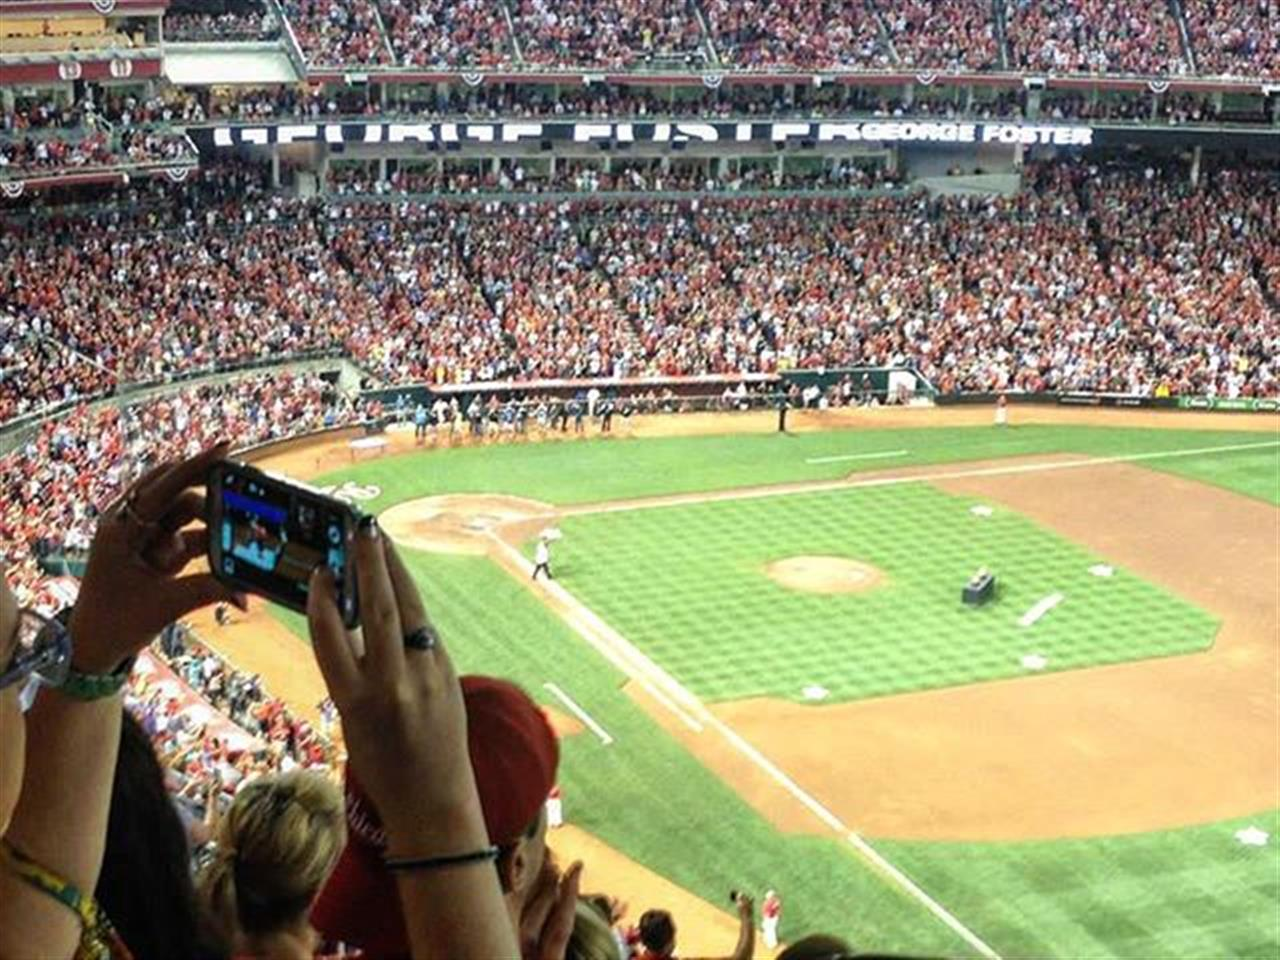 Play ball! View from the upper deck @great_american_ballpark #cincinatti #baseball #cincinnatireds #leadingrelocal #chicago #realestate #bairdandwarner #roadtrip